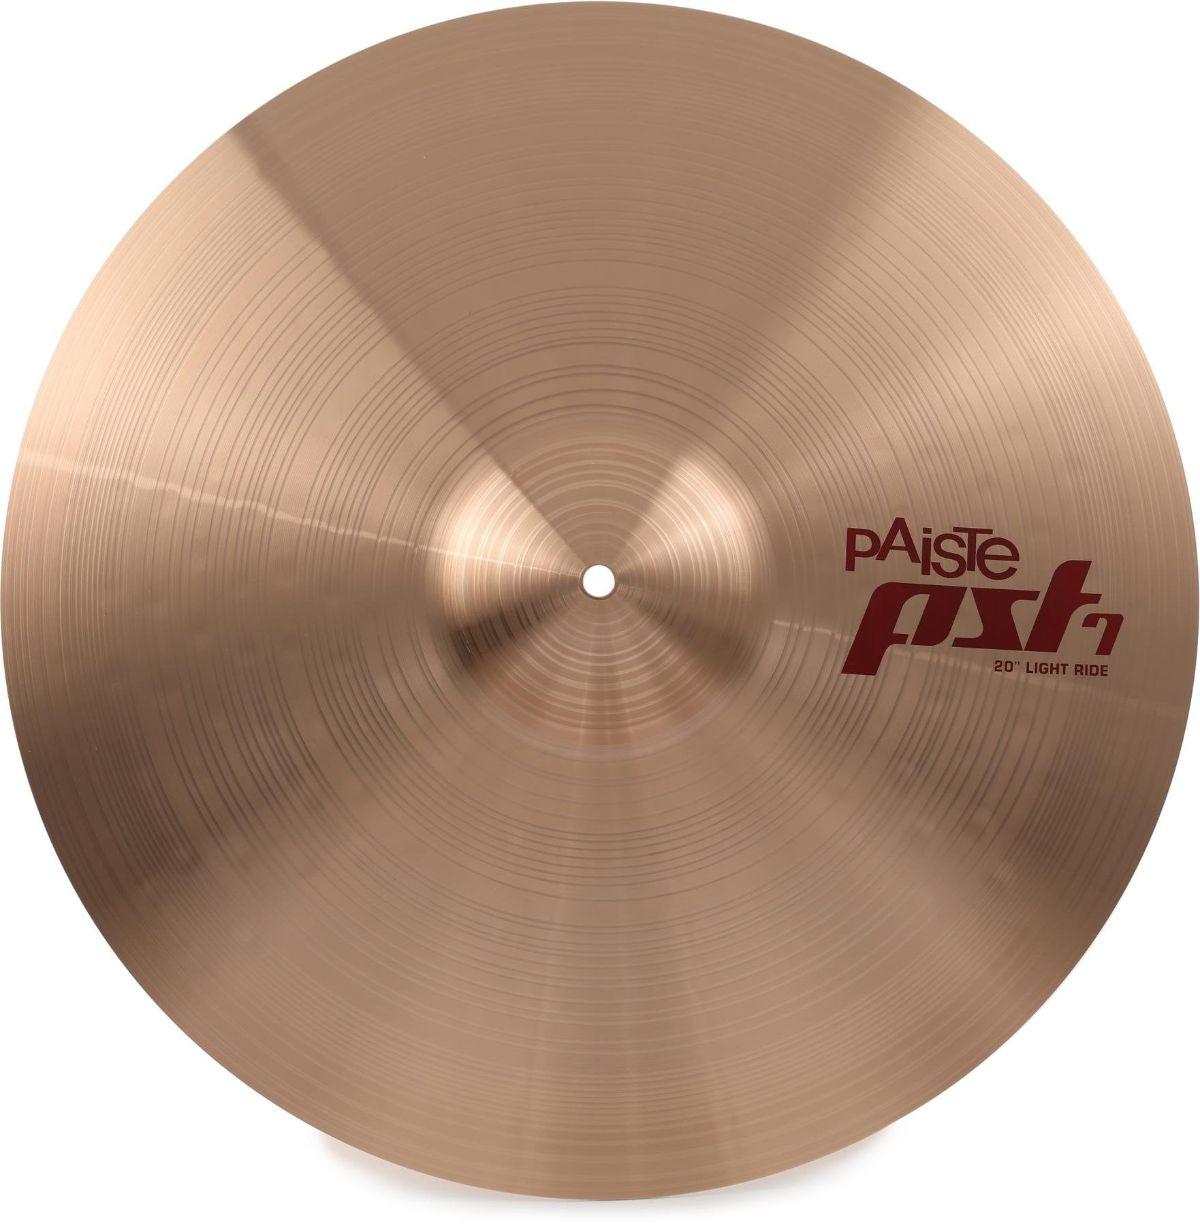 Paiste 20 PST 7 Light Ride Cymbal